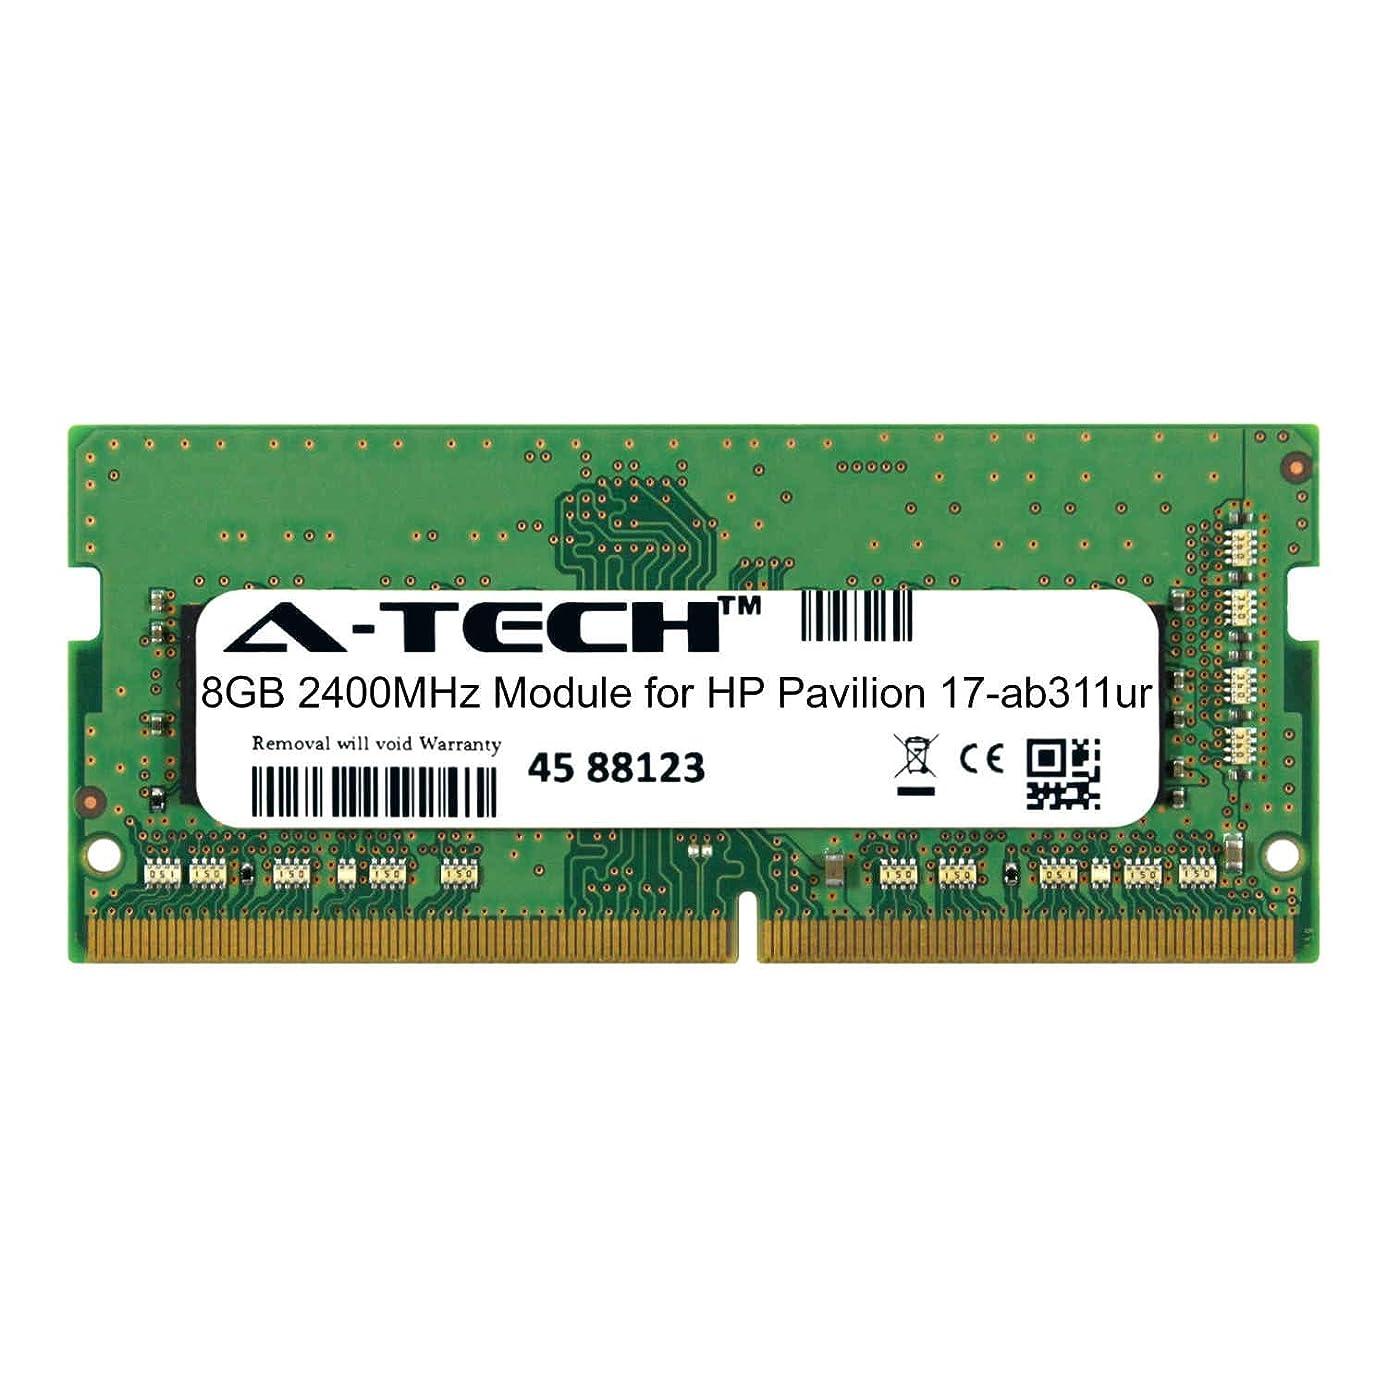 A-Tech 8GB Module for HP Pavilion 17-ab311ur Laptop & Notebook Compatible DDR4 2400Mhz Memory Ram (ATMS310536A25827X1)